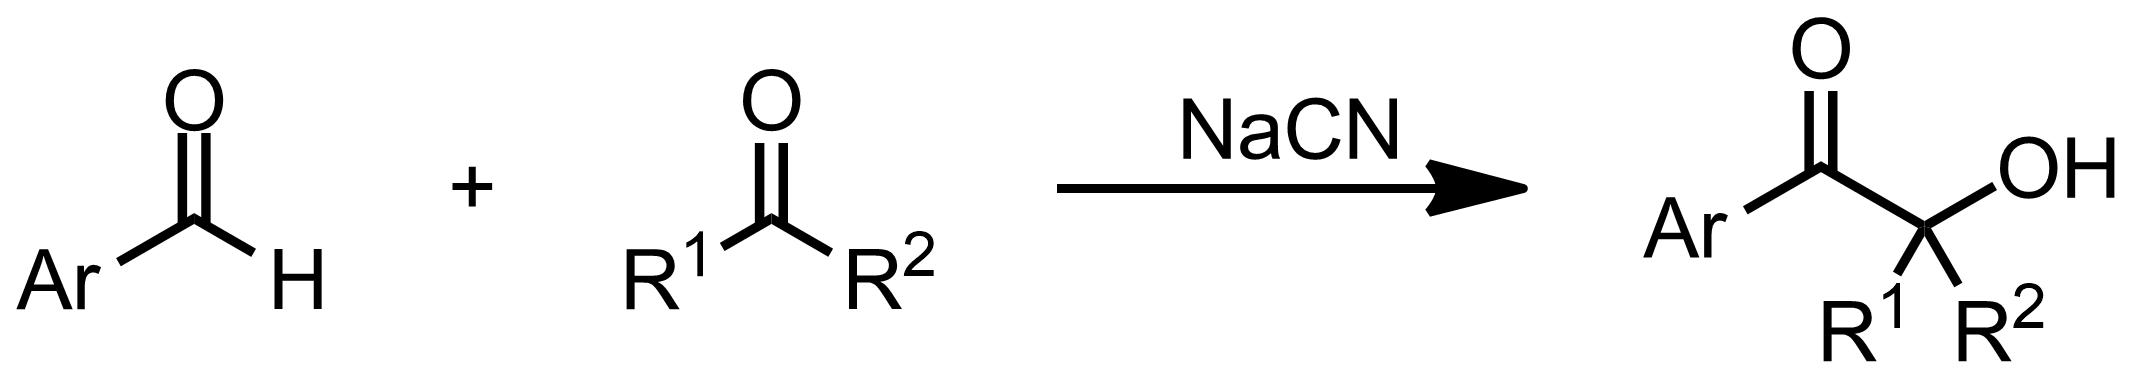 Schematic representation of the Benzoin Condensation.